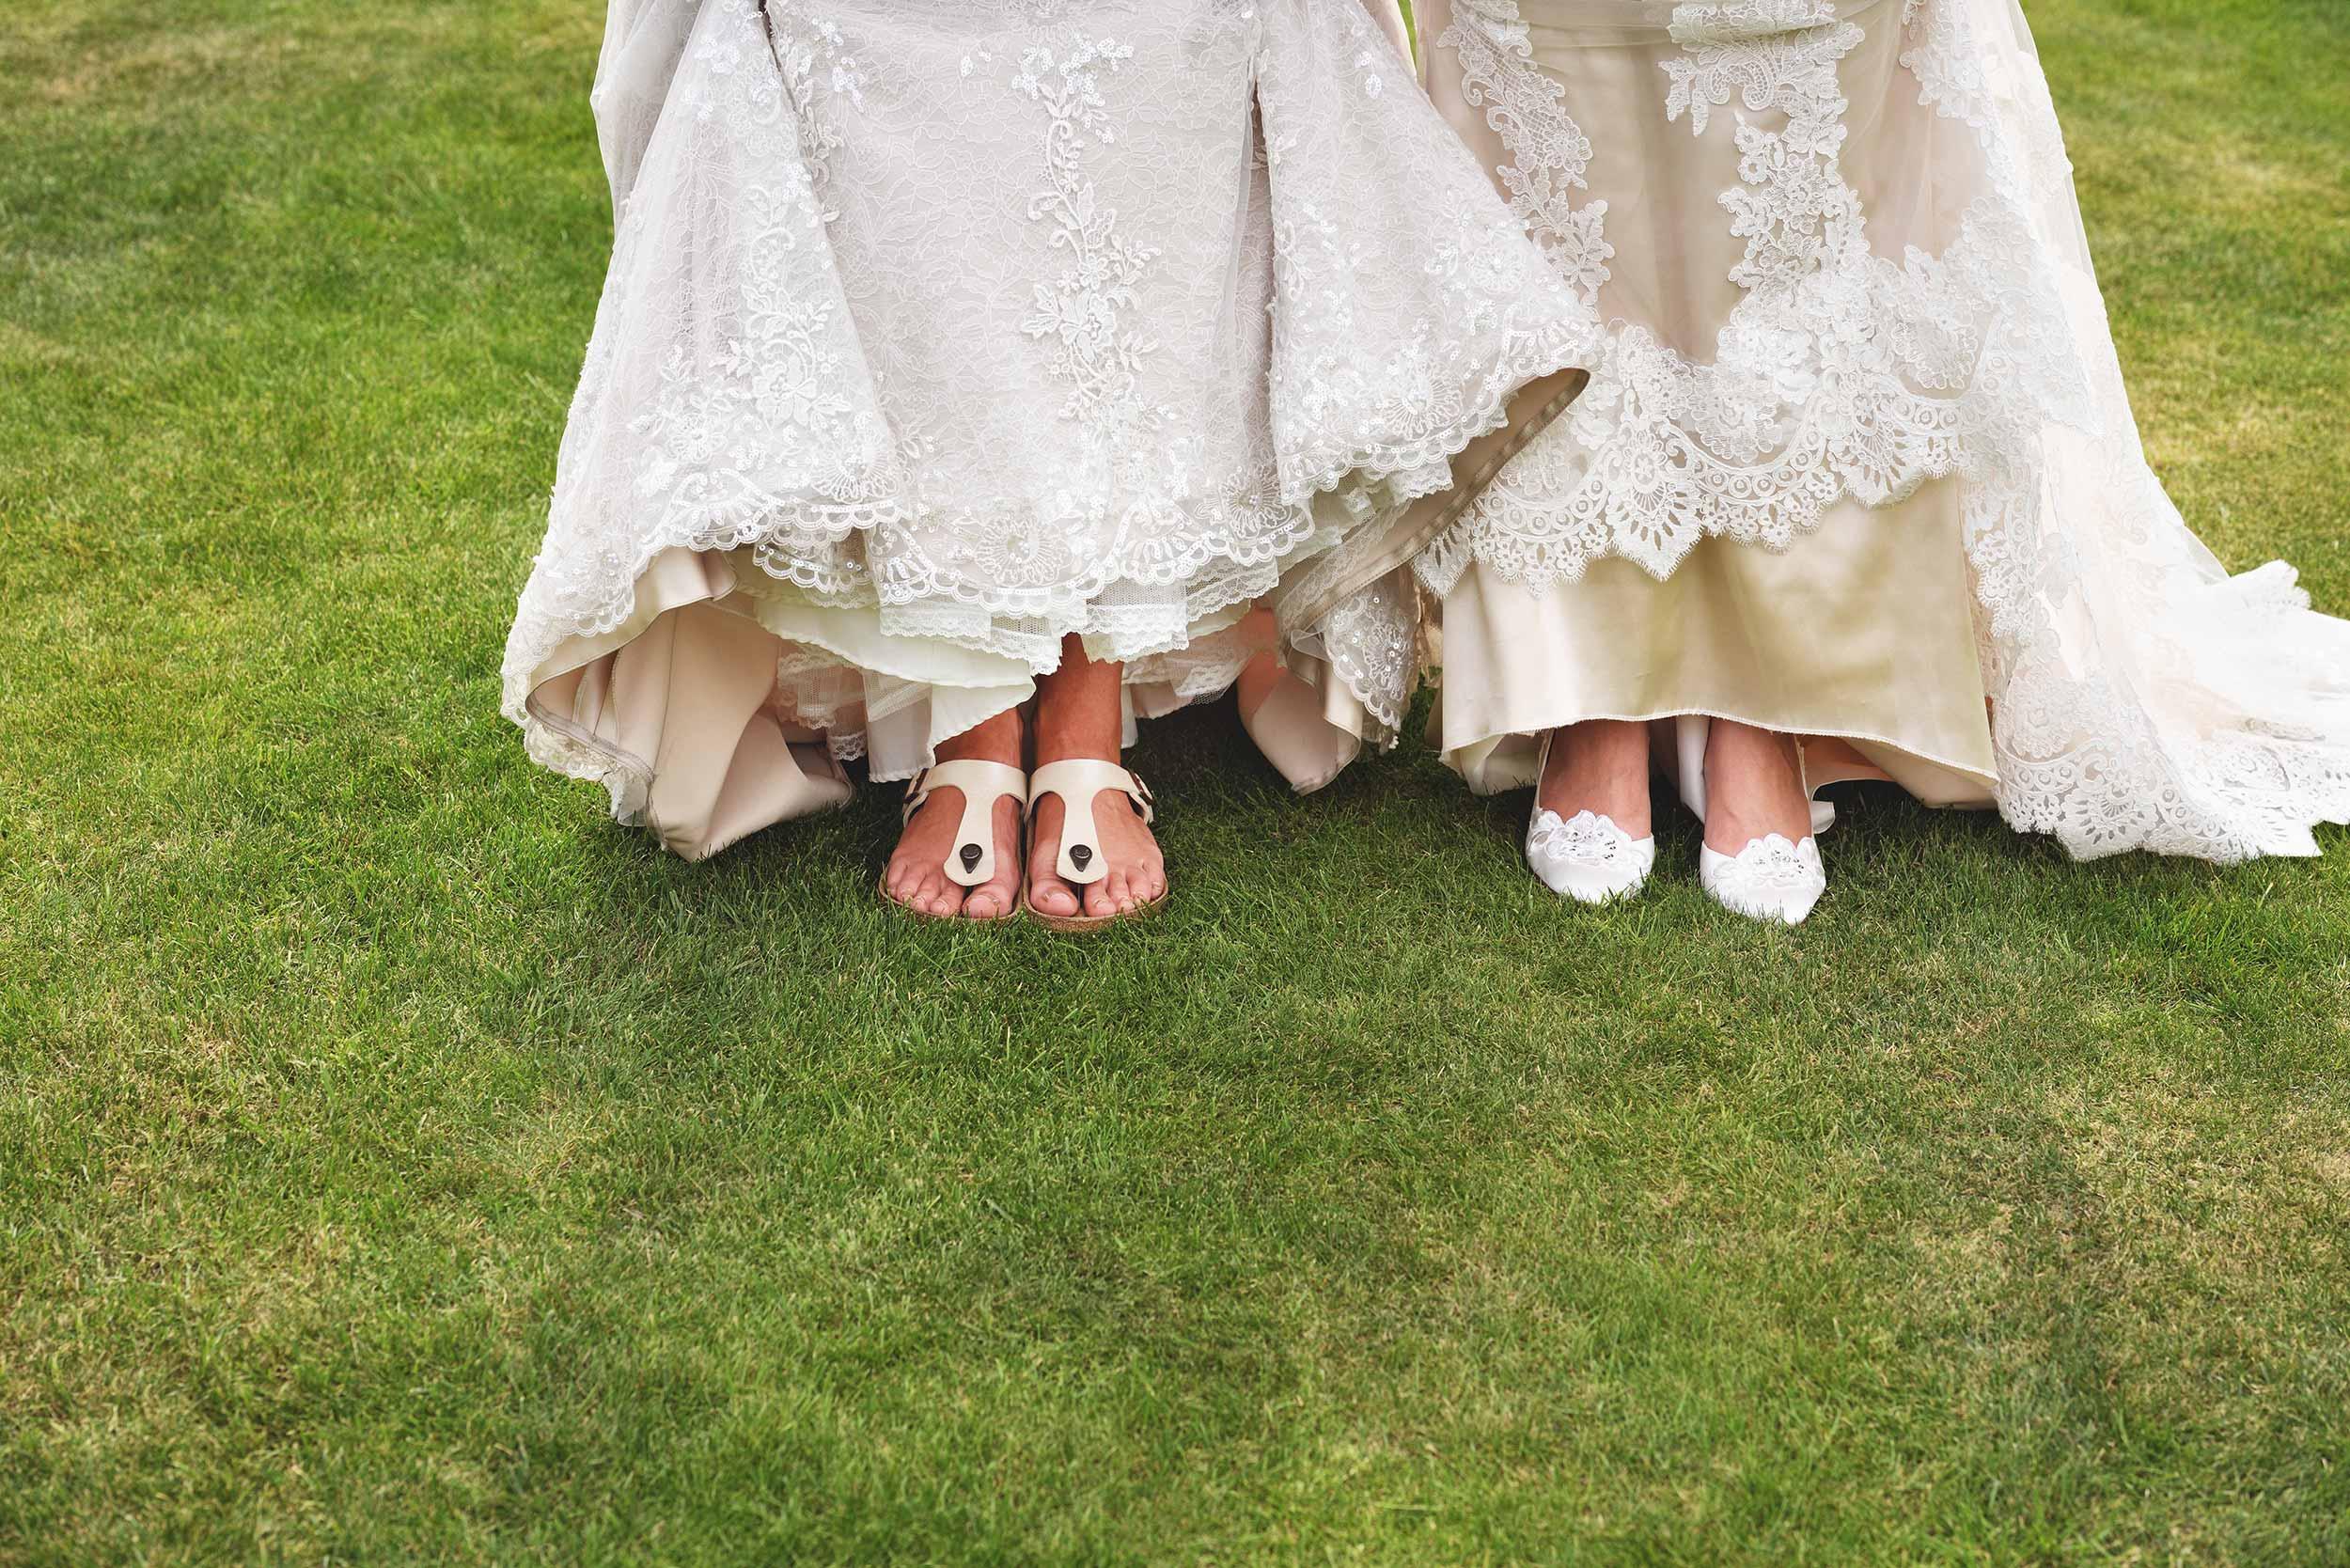 same-sex wedding photos at Tower Hill Barns LGBTW+ friendly wedding venue